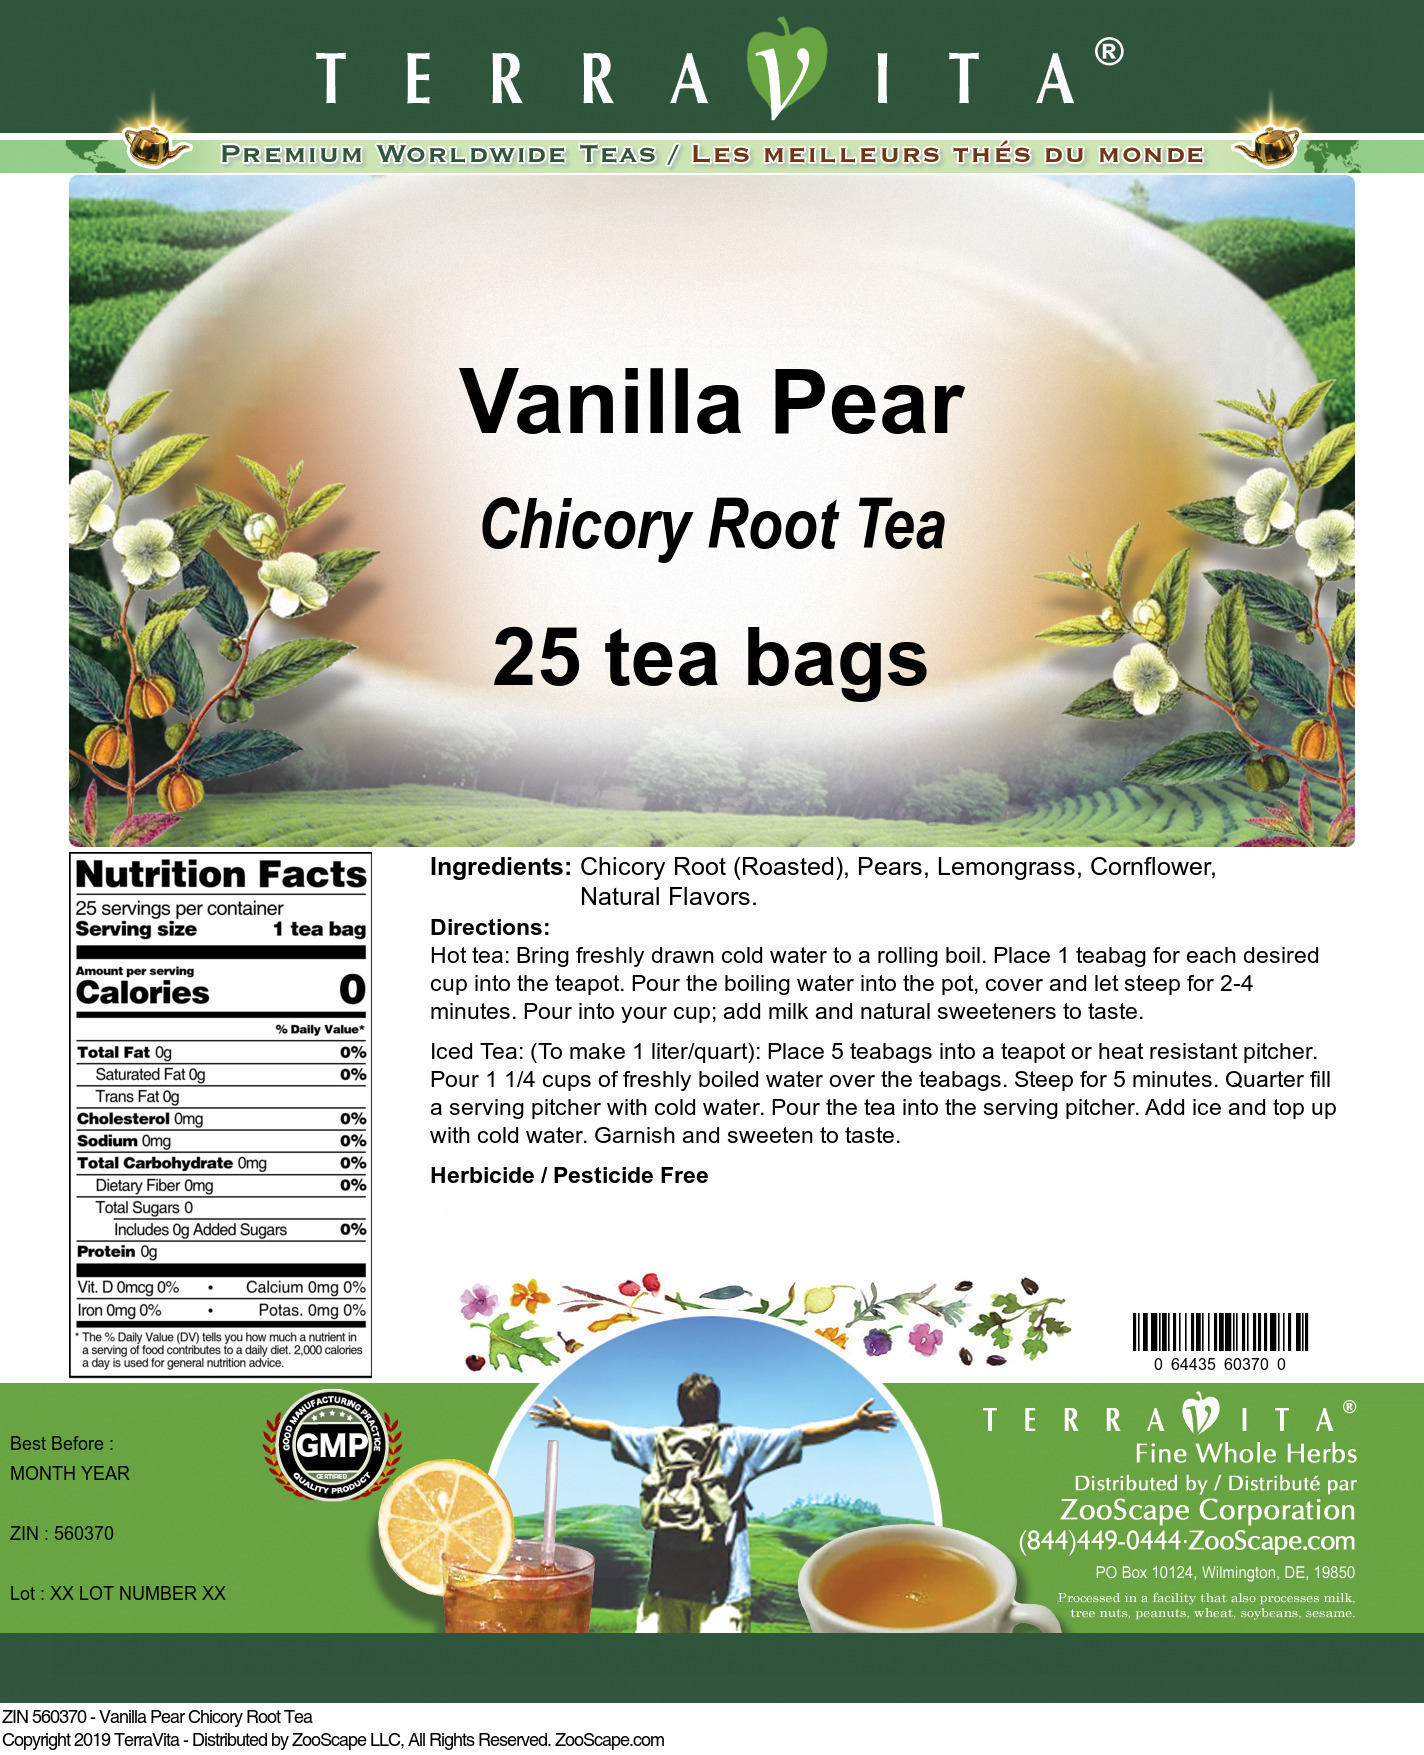 Vanilla Pear Chicory Root Tea